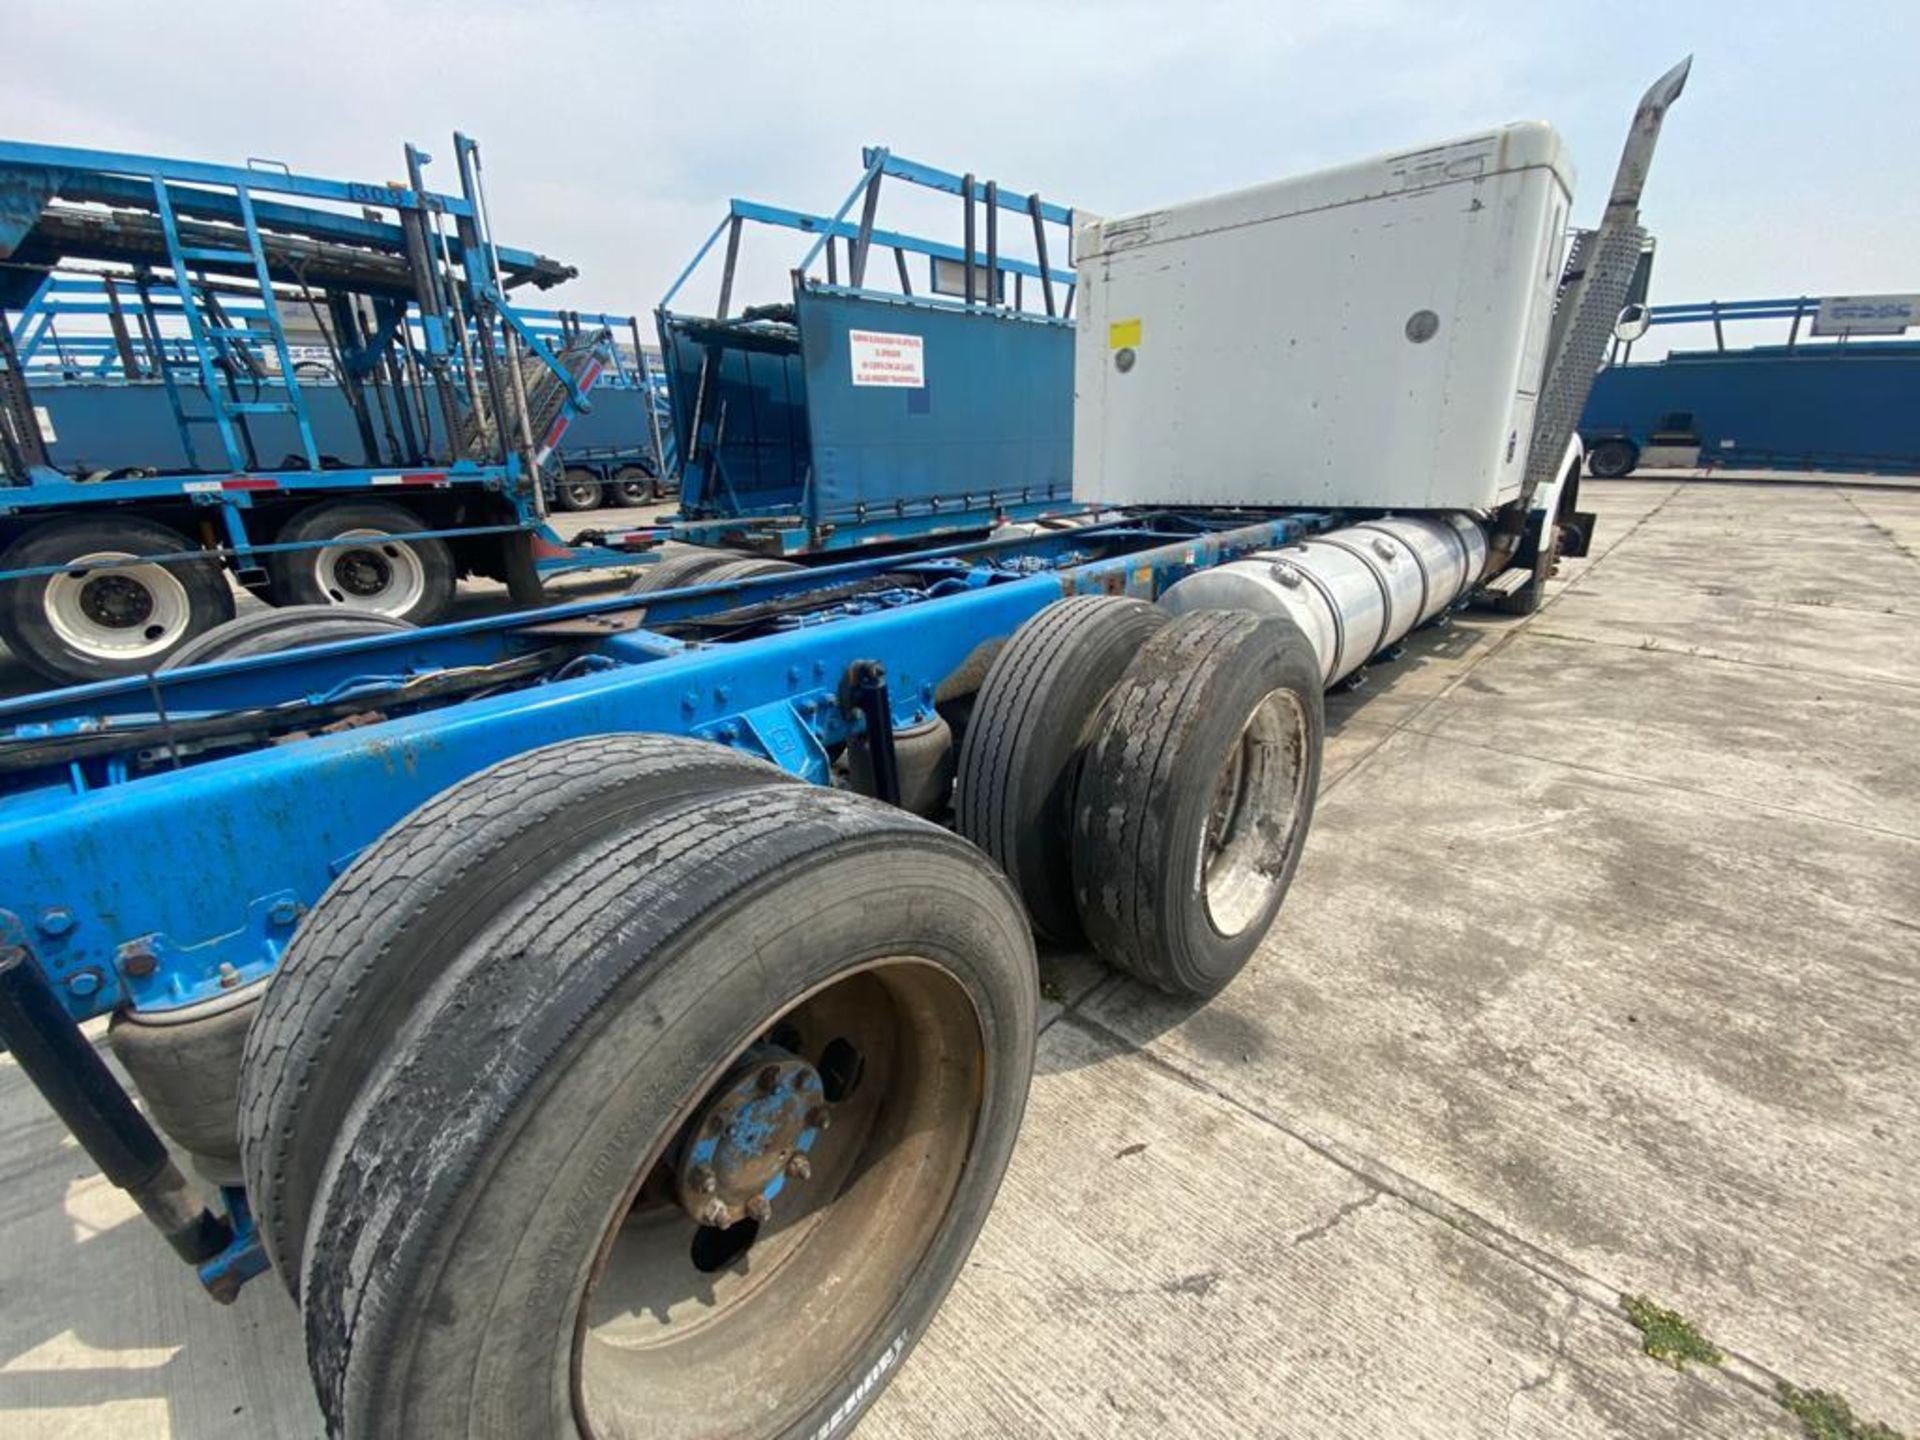 1999 Kenworth Sleeper truck tractor, standard transmission of 18 speeds - Image 19 of 62